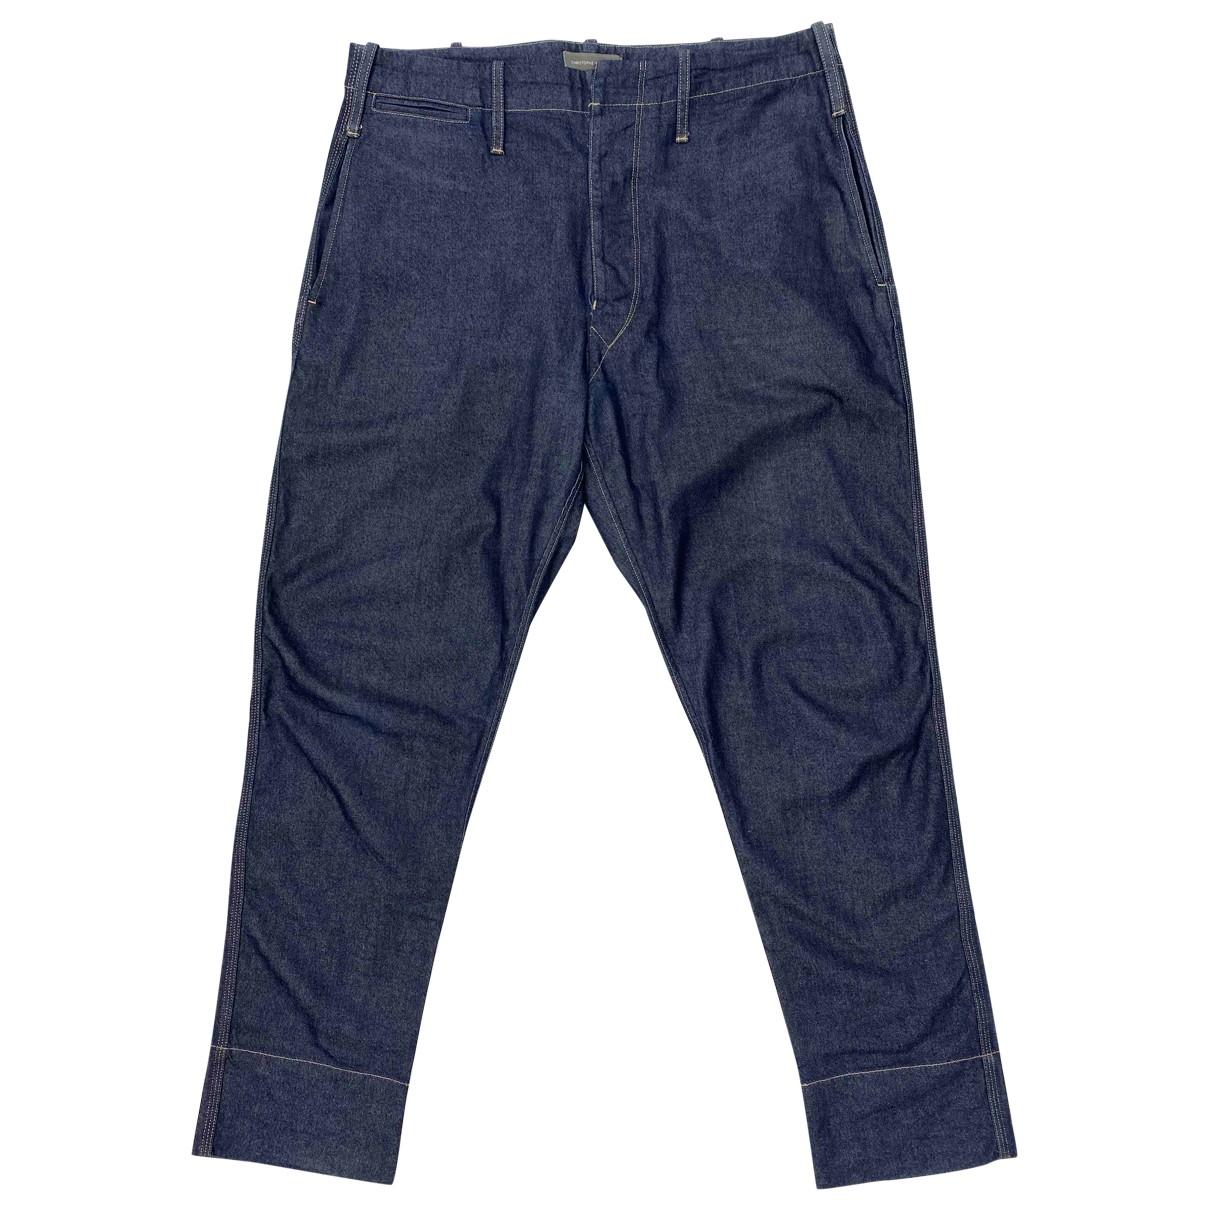 Lemaire \N Blue Denim - Jeans Trousers for Men 52 IT